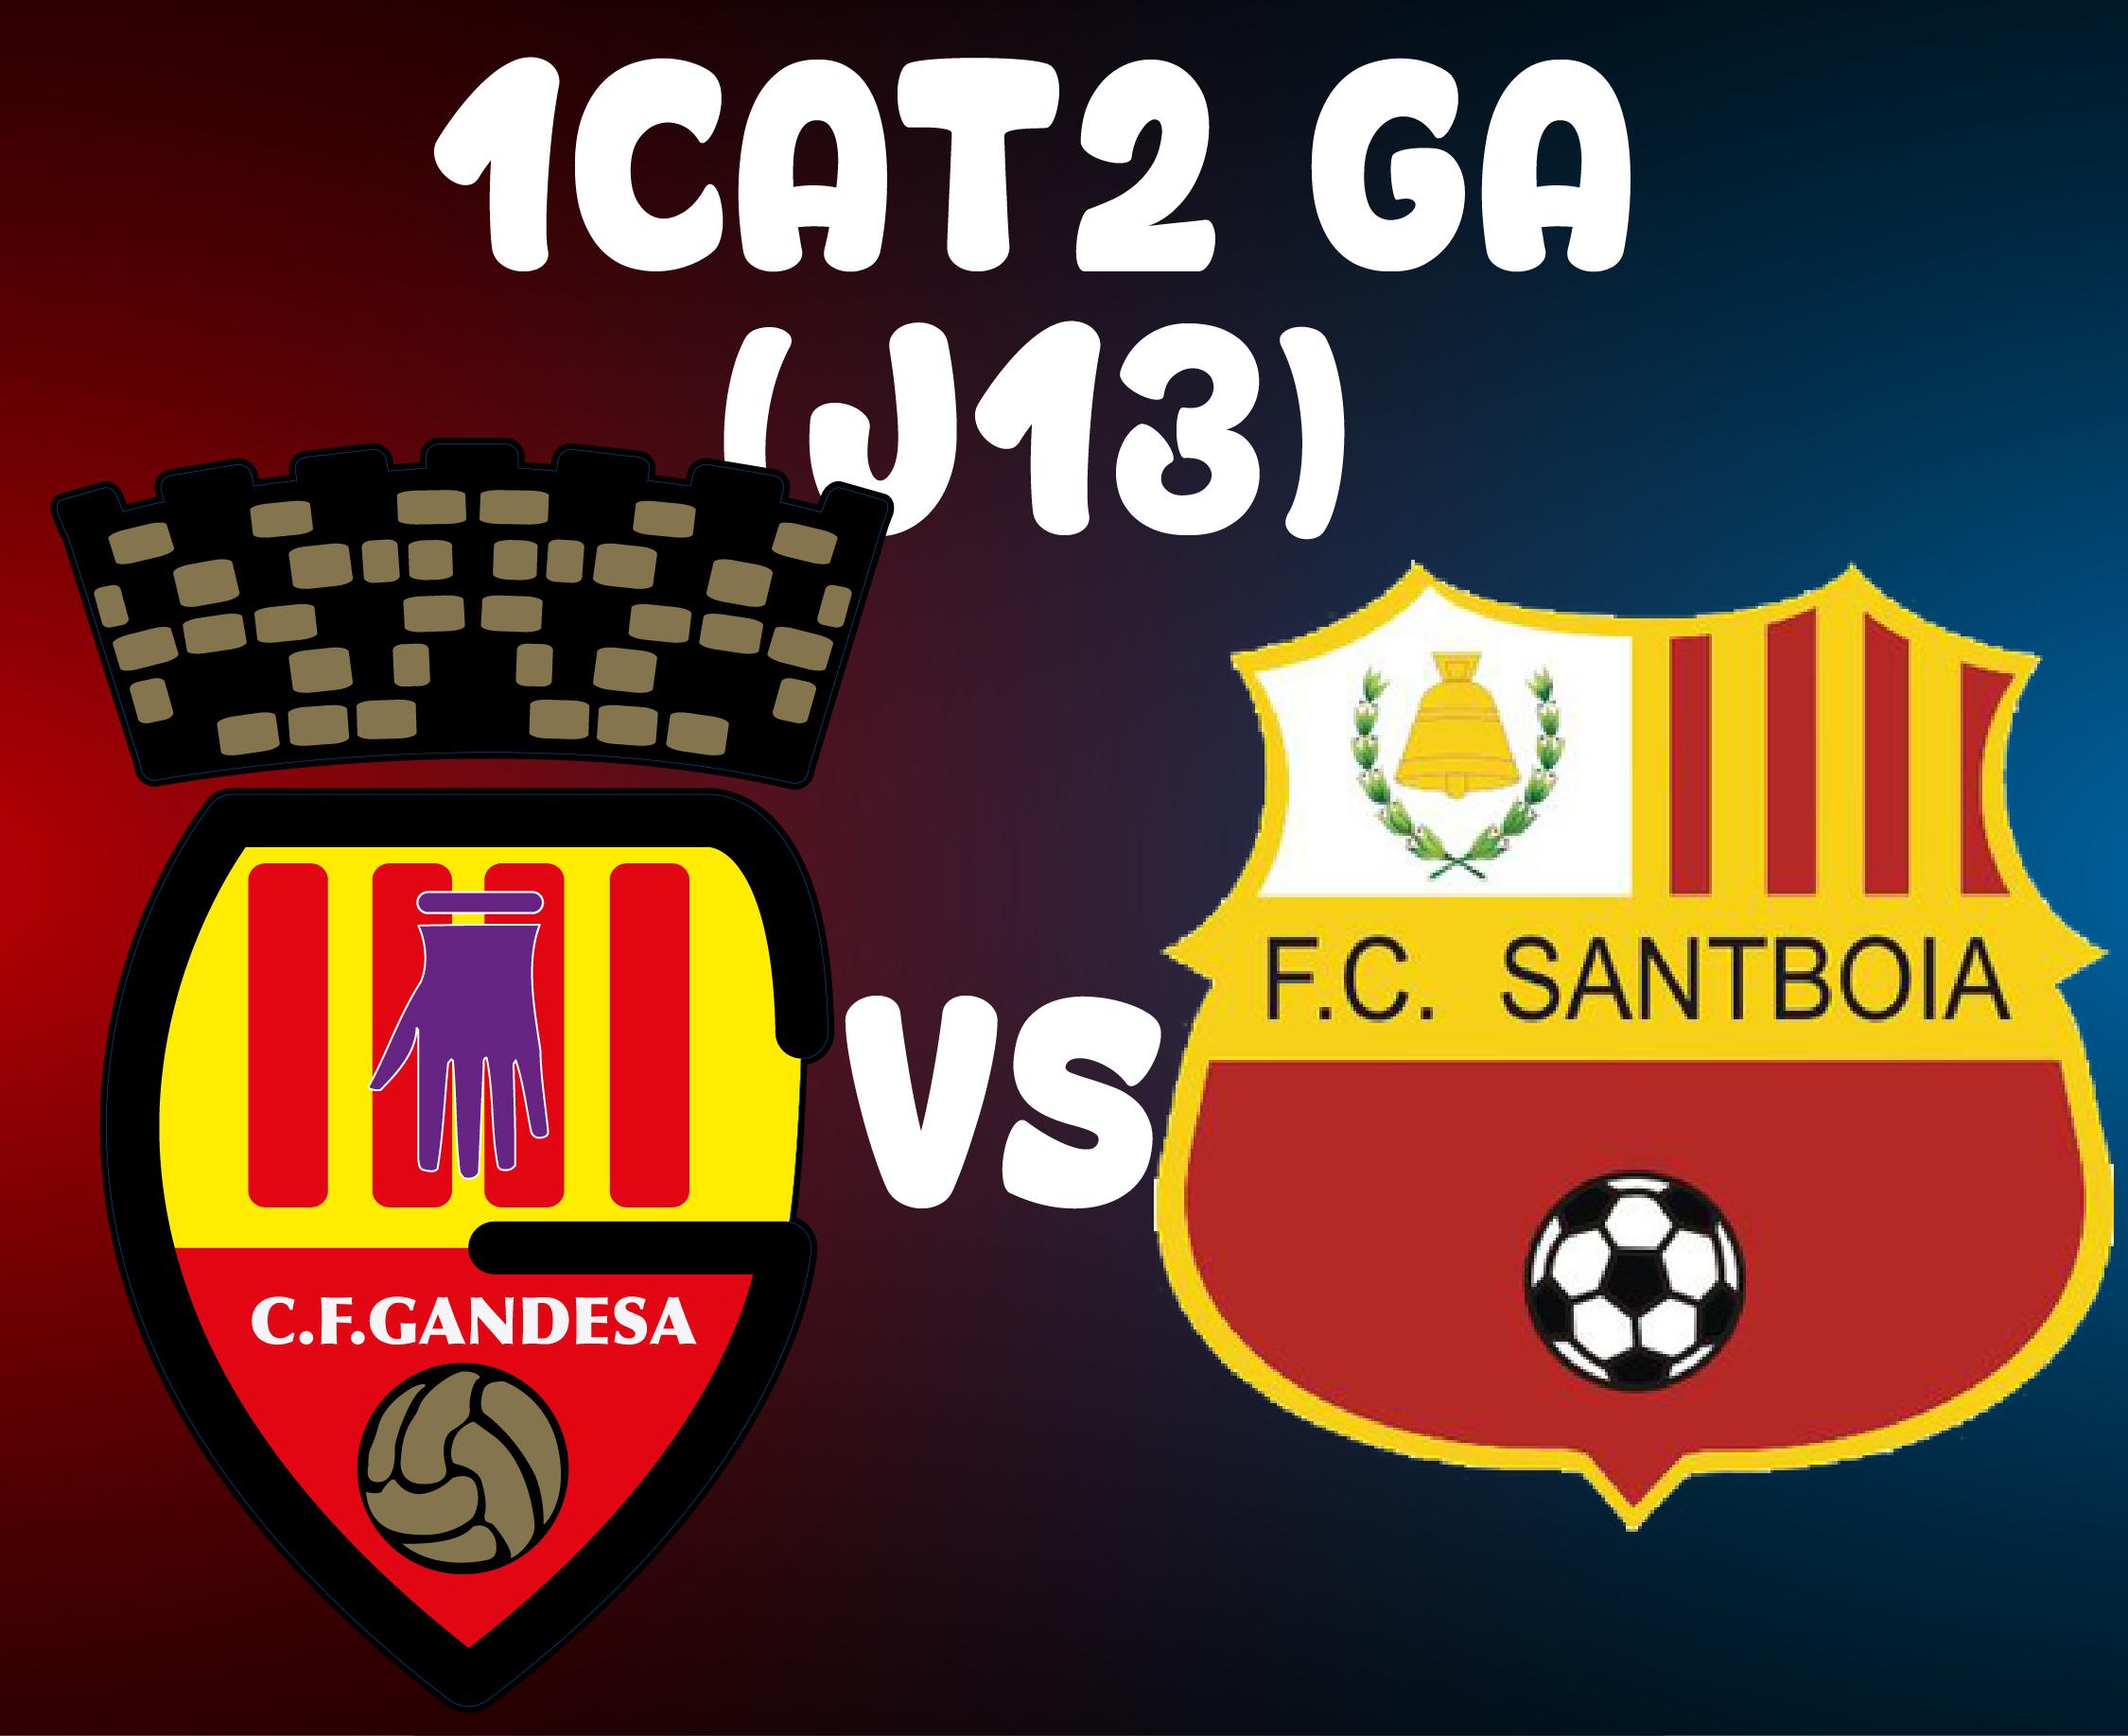 J13 > CF GANDESA (A) VS FC SANTBOIÀ